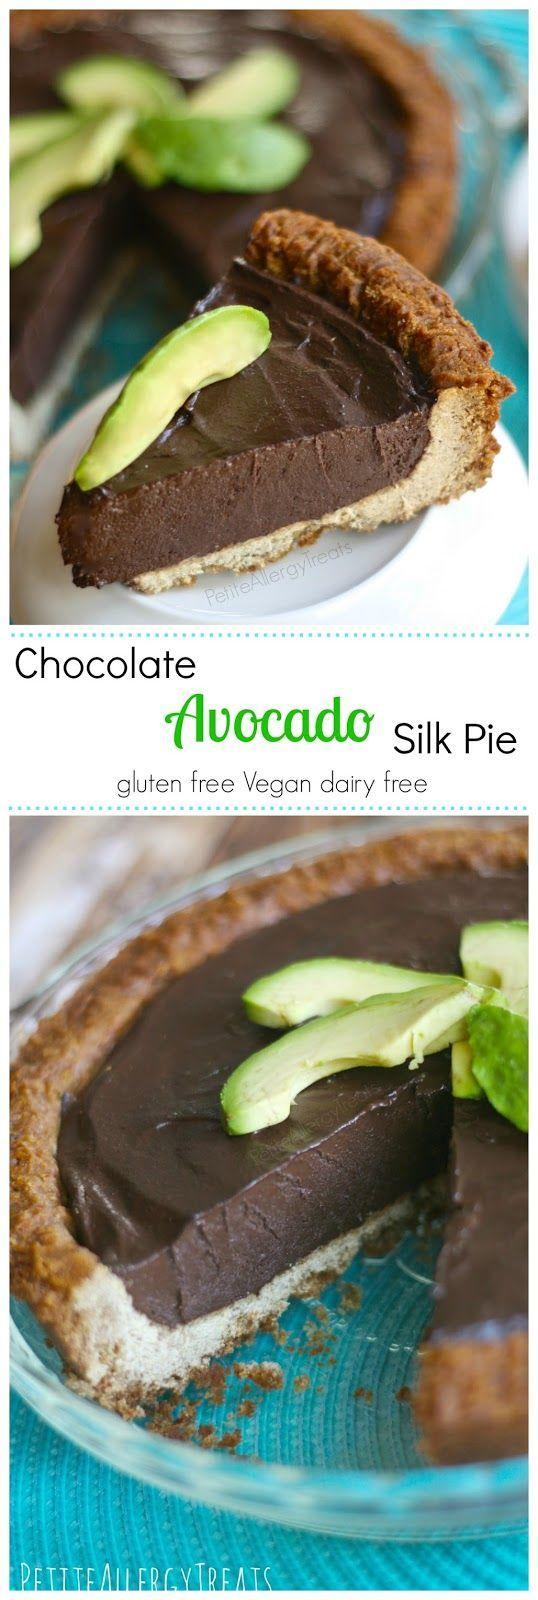 Healthy Chocolate Silk Pie - Decadent chocolate and avocado blended to a silky pie, no added fat or sugar. #vegan #glutenfree #dairyfree